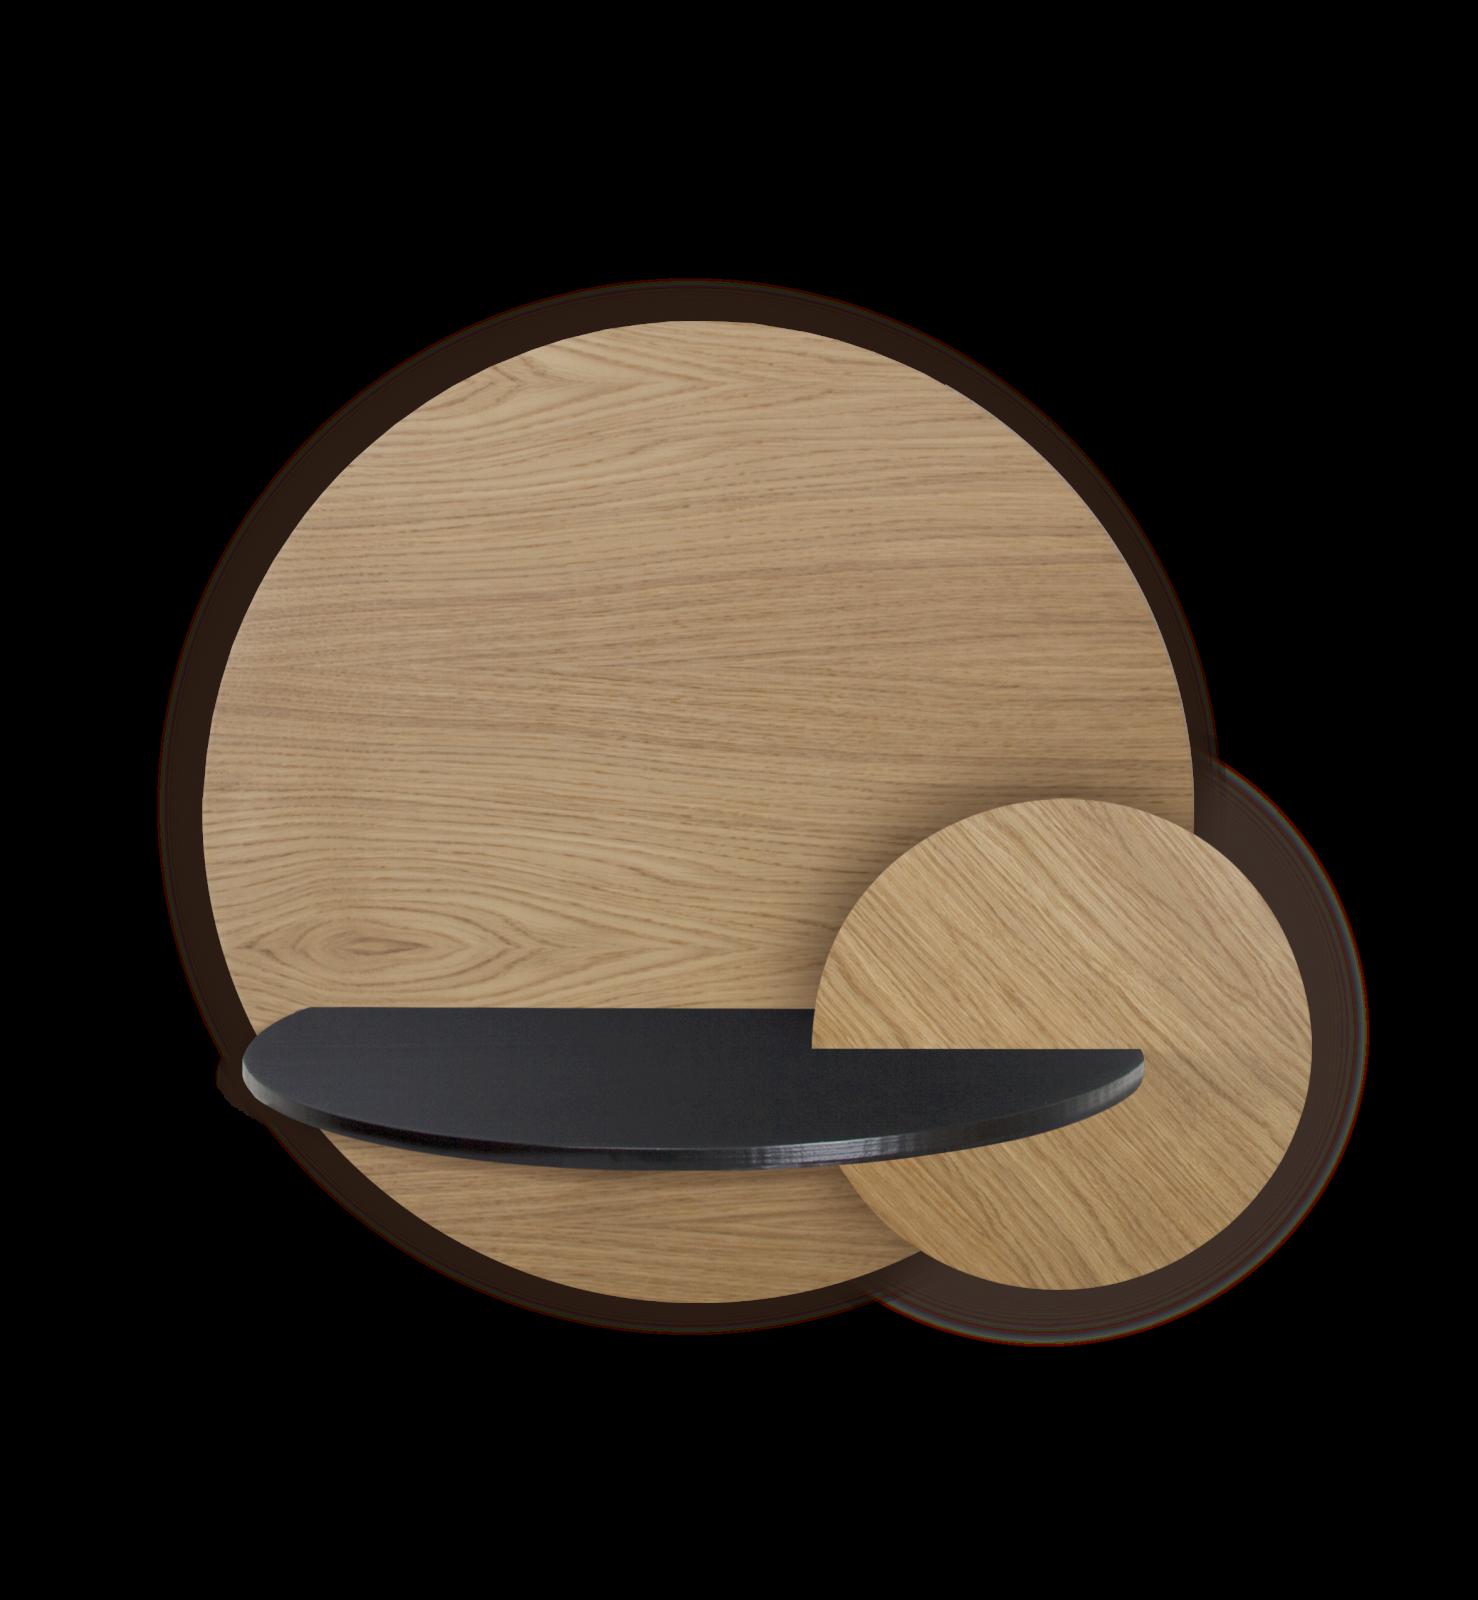 ALBA L - Round. Modular bedside shelf. Storage. Customizable. ALBA L, Oak Round, Black cover and cir